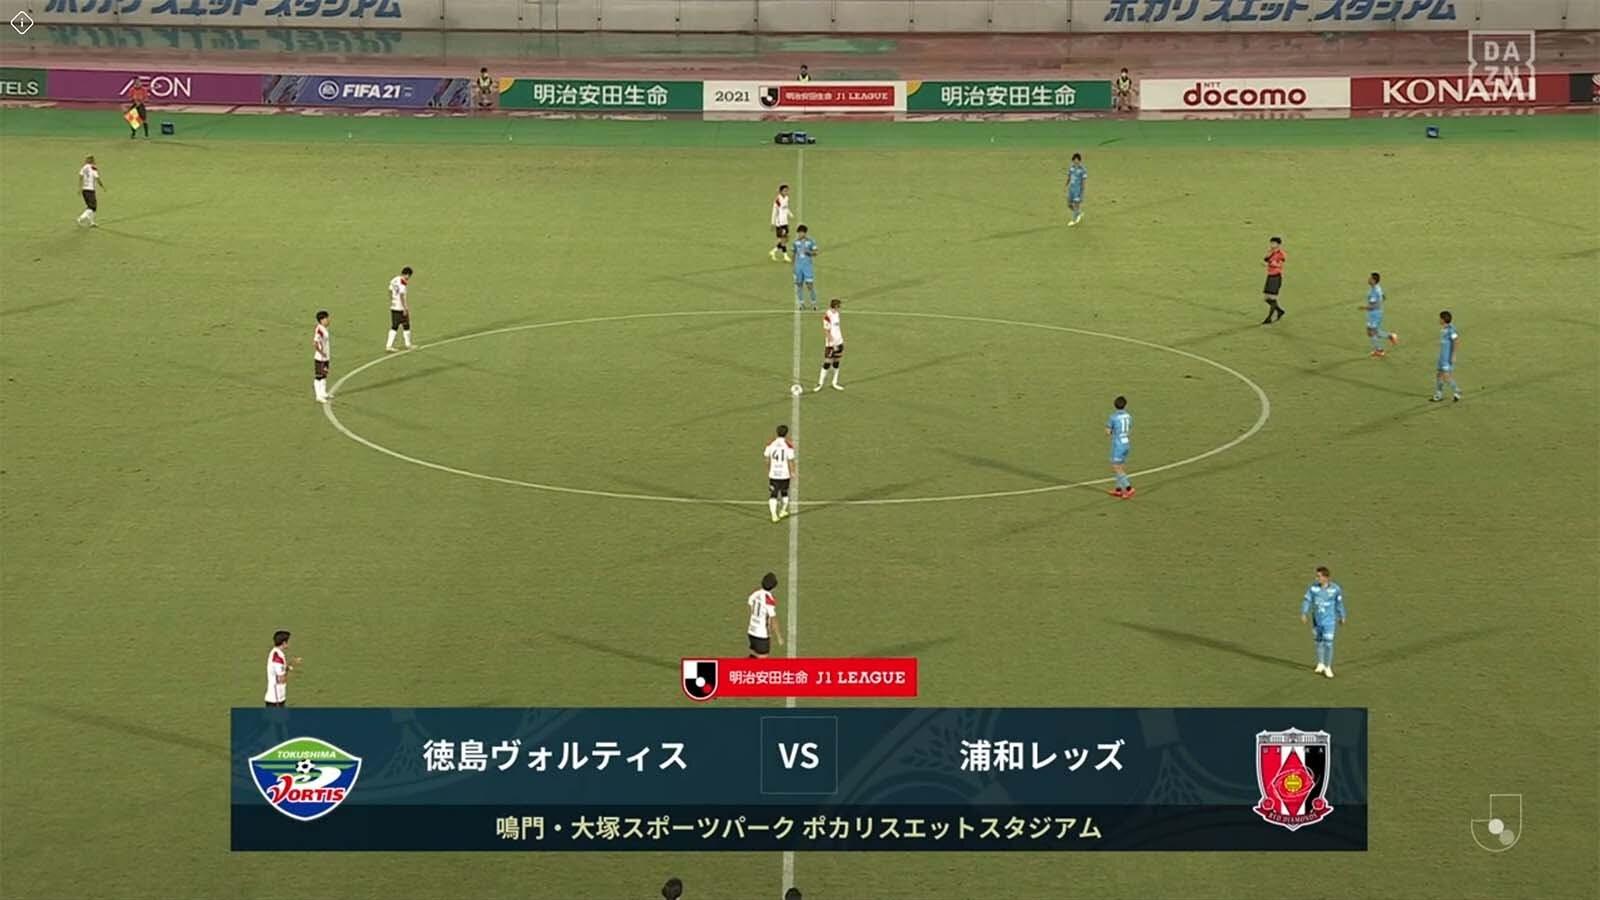 2021 Jリーグ 第25節 鳴門・大塚スポーツパーク ポカリスエットスタジアム アウェー 徳島ヴォルティス戦